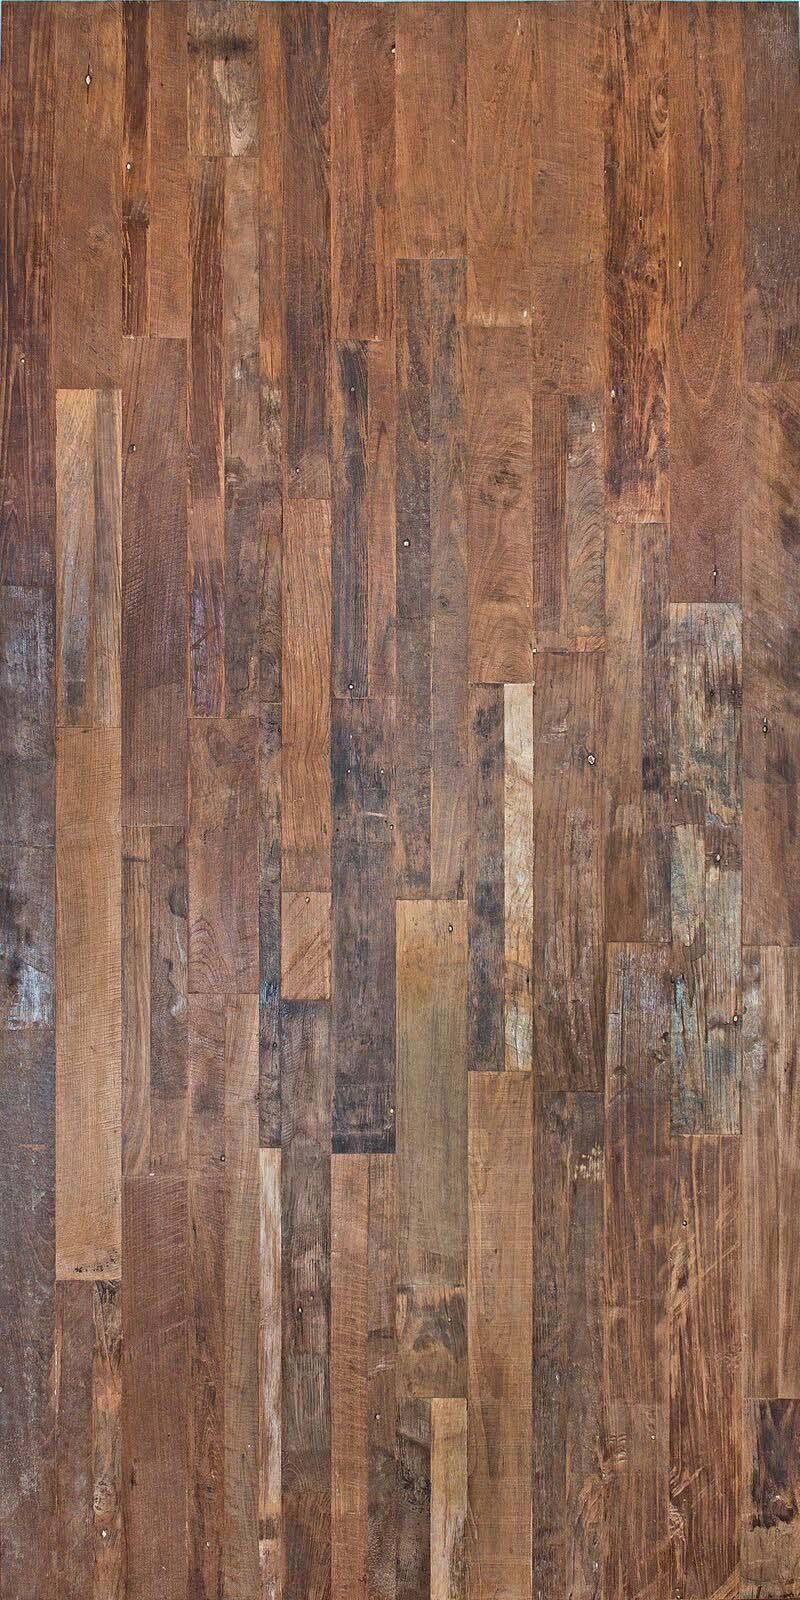 patina full sheet - Reclaimed Teak Plywood Panels